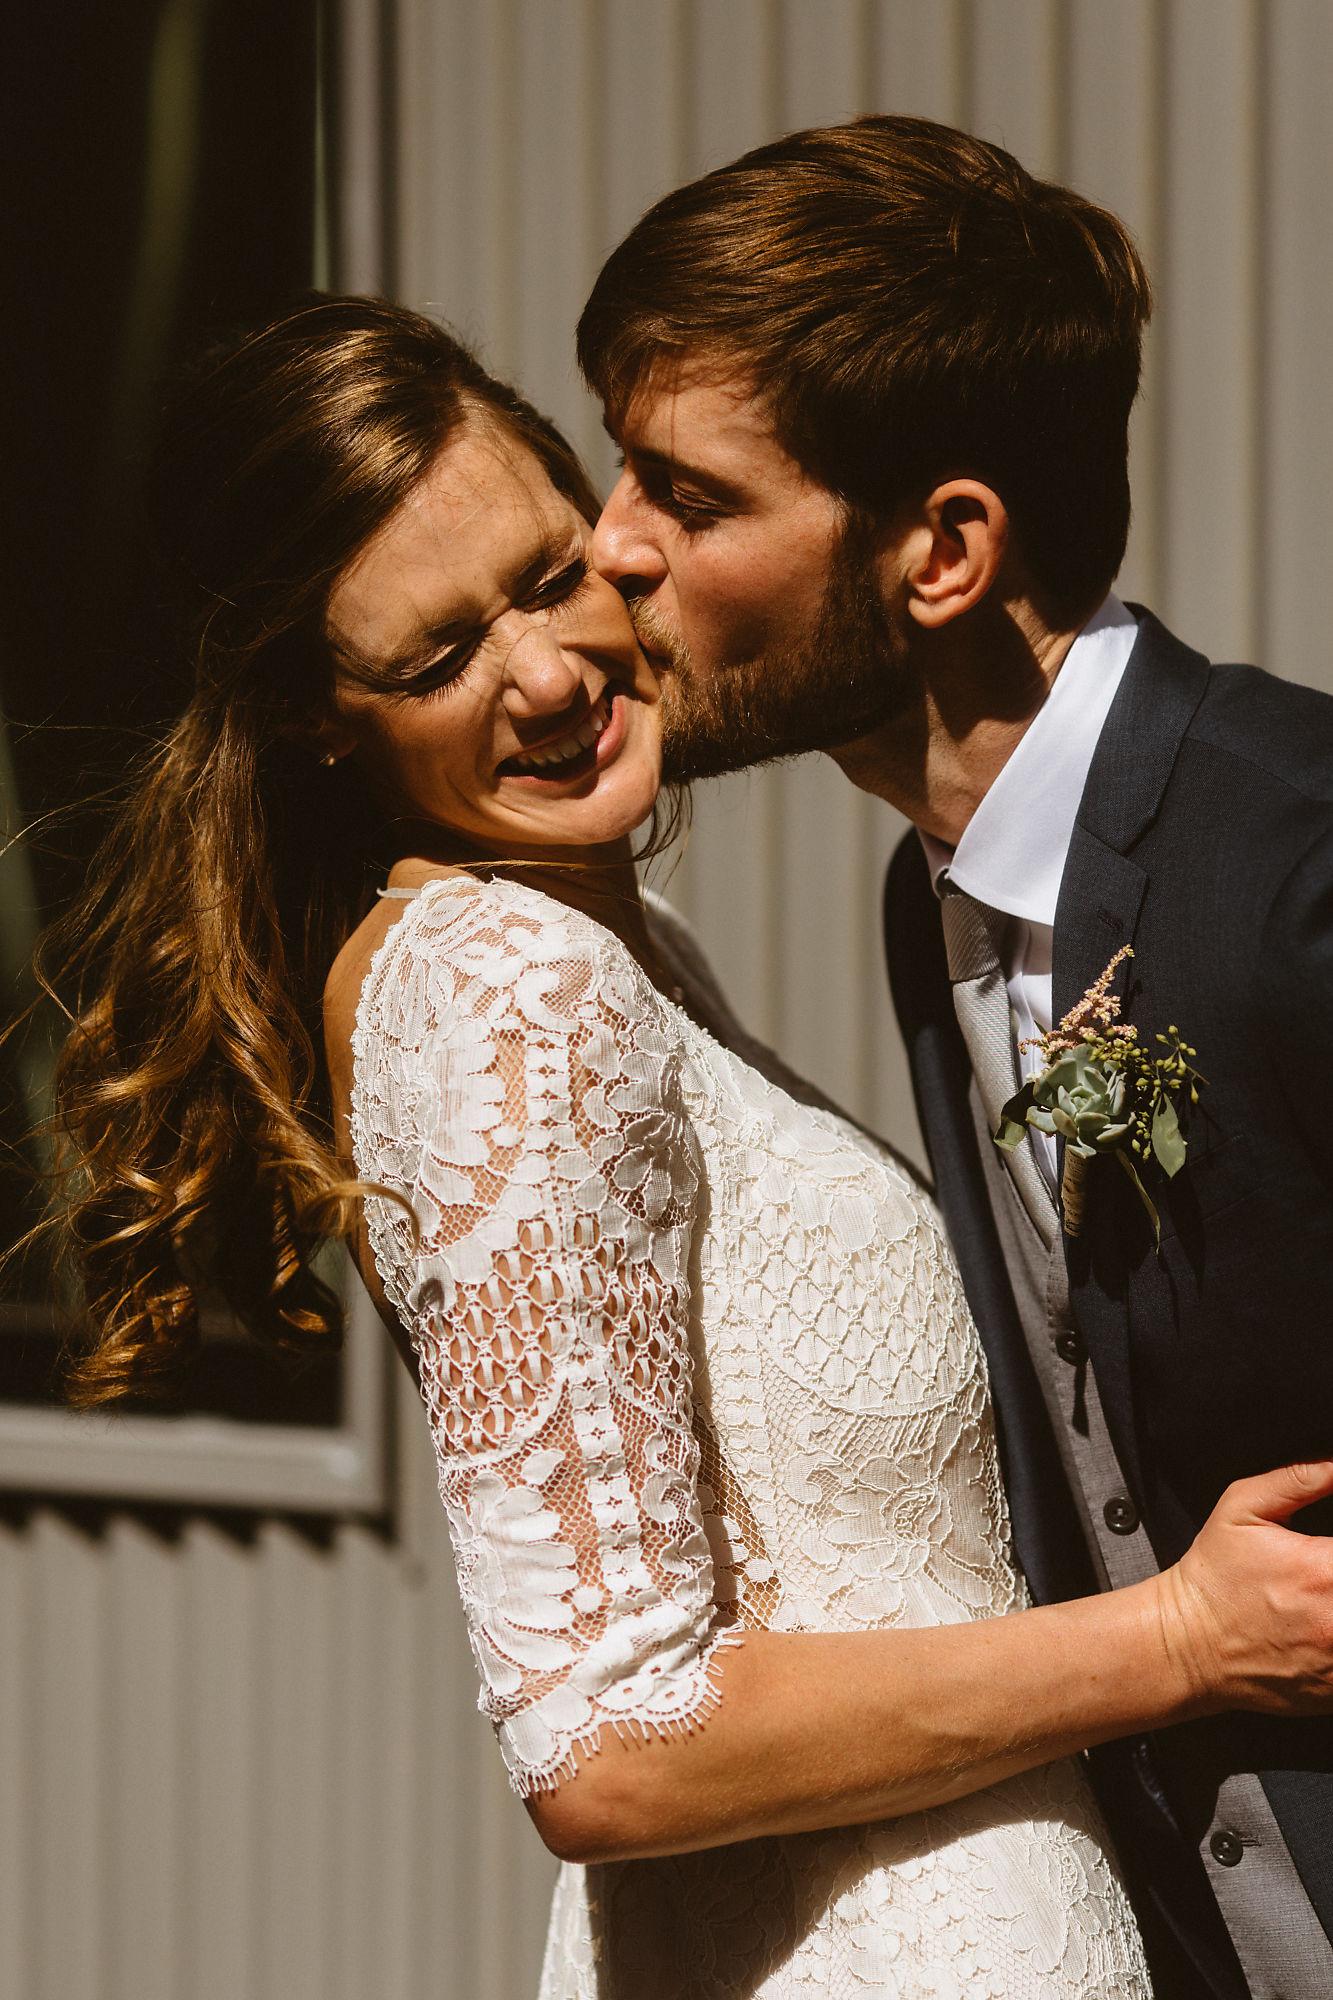 jessica_austin_oasis_brewery_wedding_photos135529.jpg